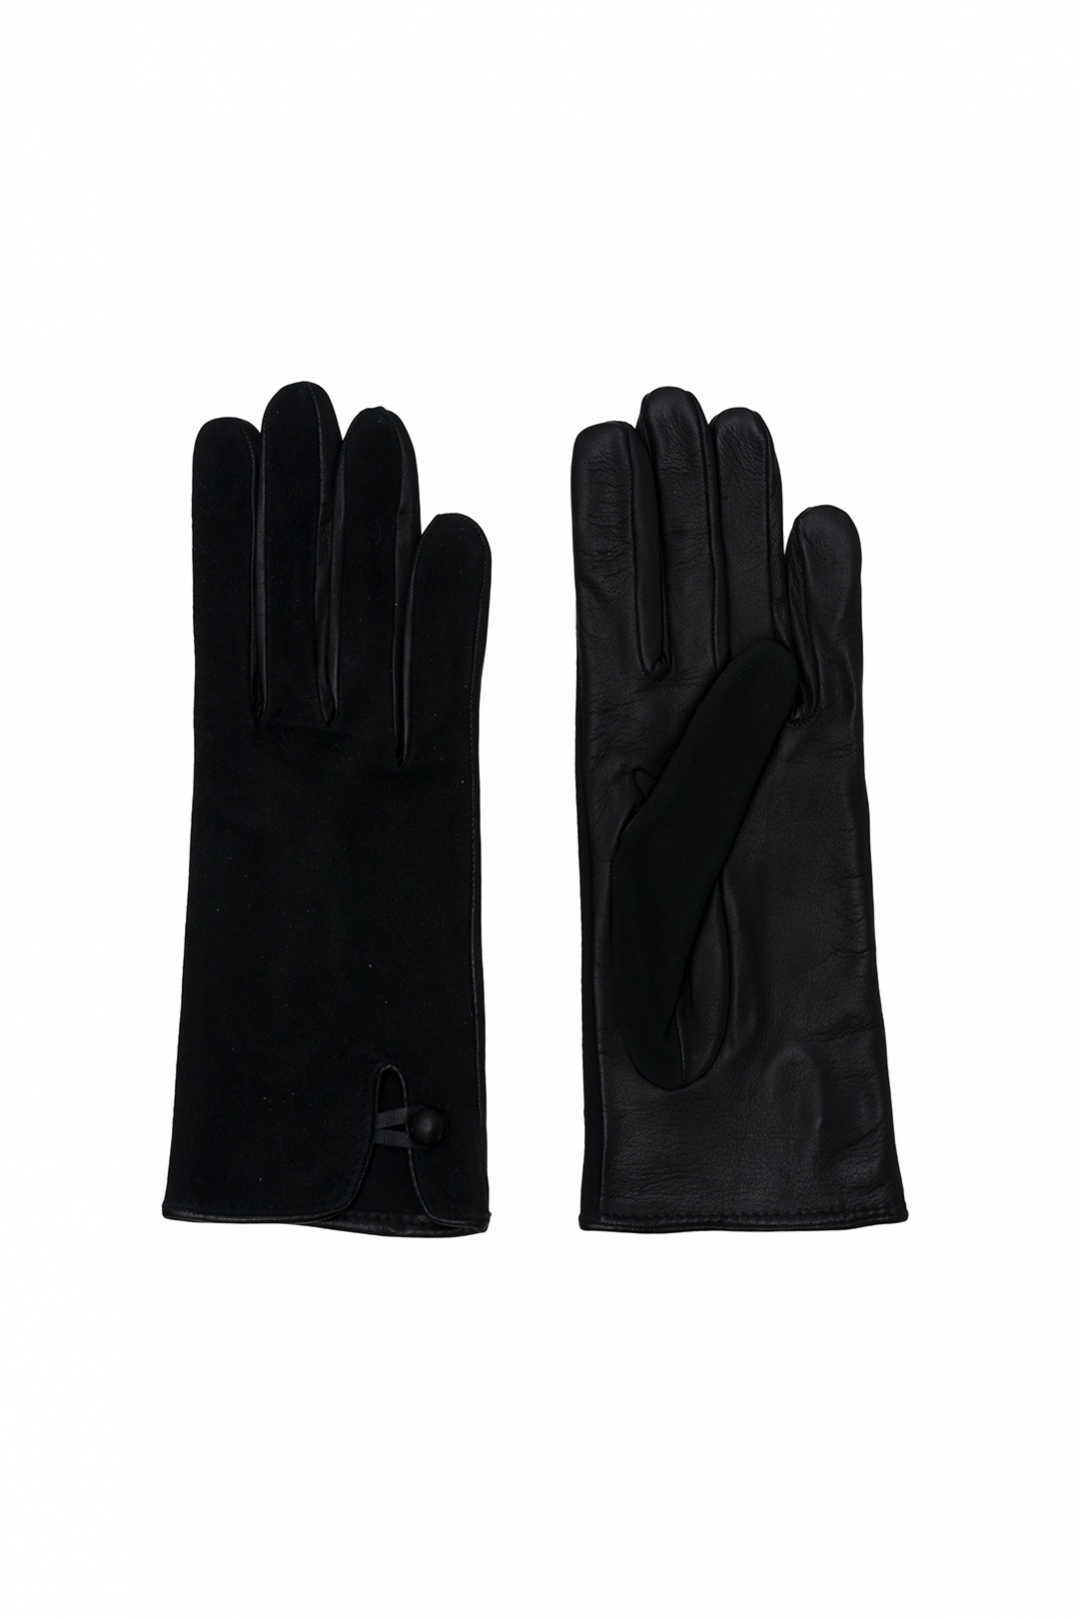 front - Guantes Short Black